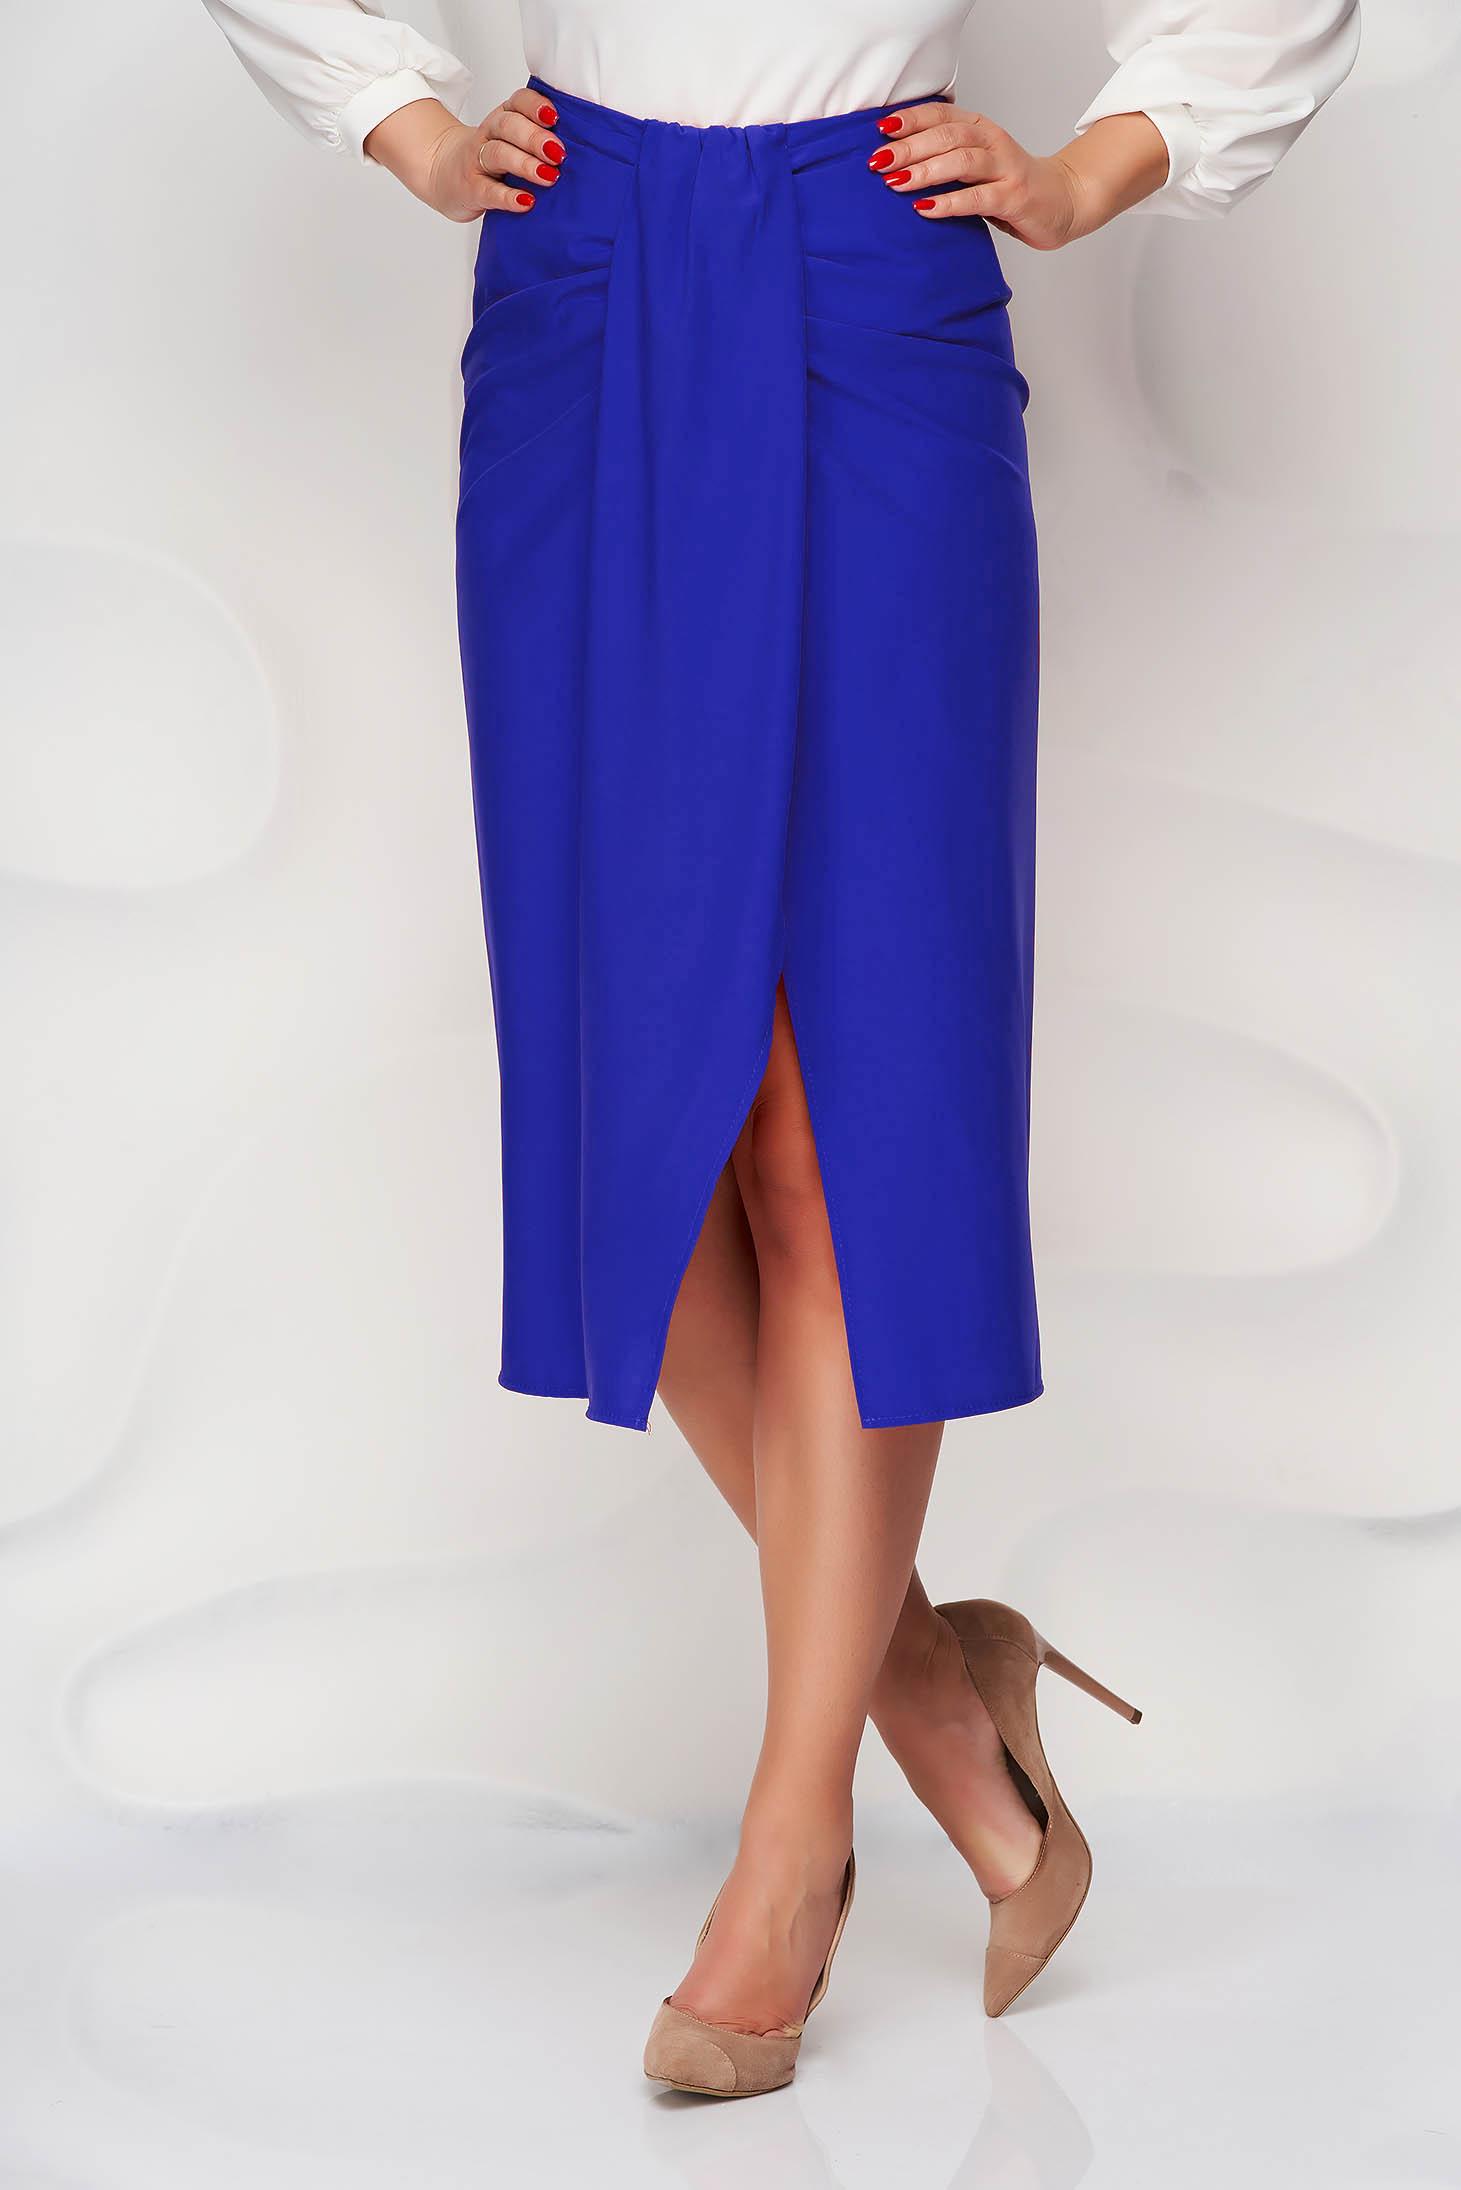 Blue skirt pencil slit nonelastic fabric